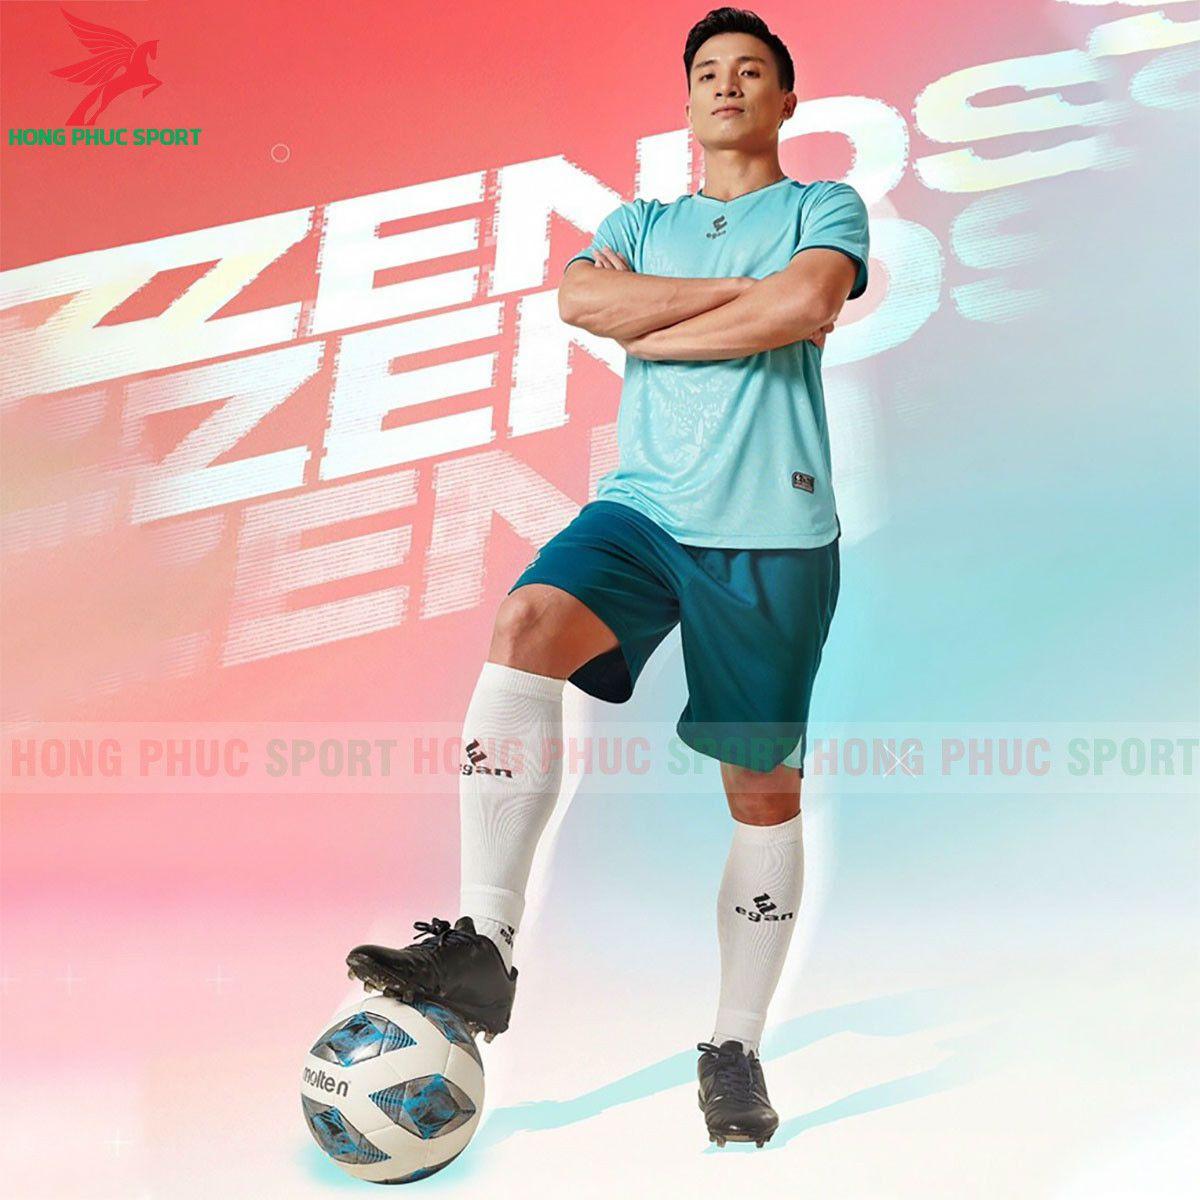 https://cdn.hongphucsport.com/unsafe/s4.shopbay.vn/files/285/ao-bong-da-khong-logo-egan-2021-zenos-xanh-ngoc-60f5436e7bd8d.jpg